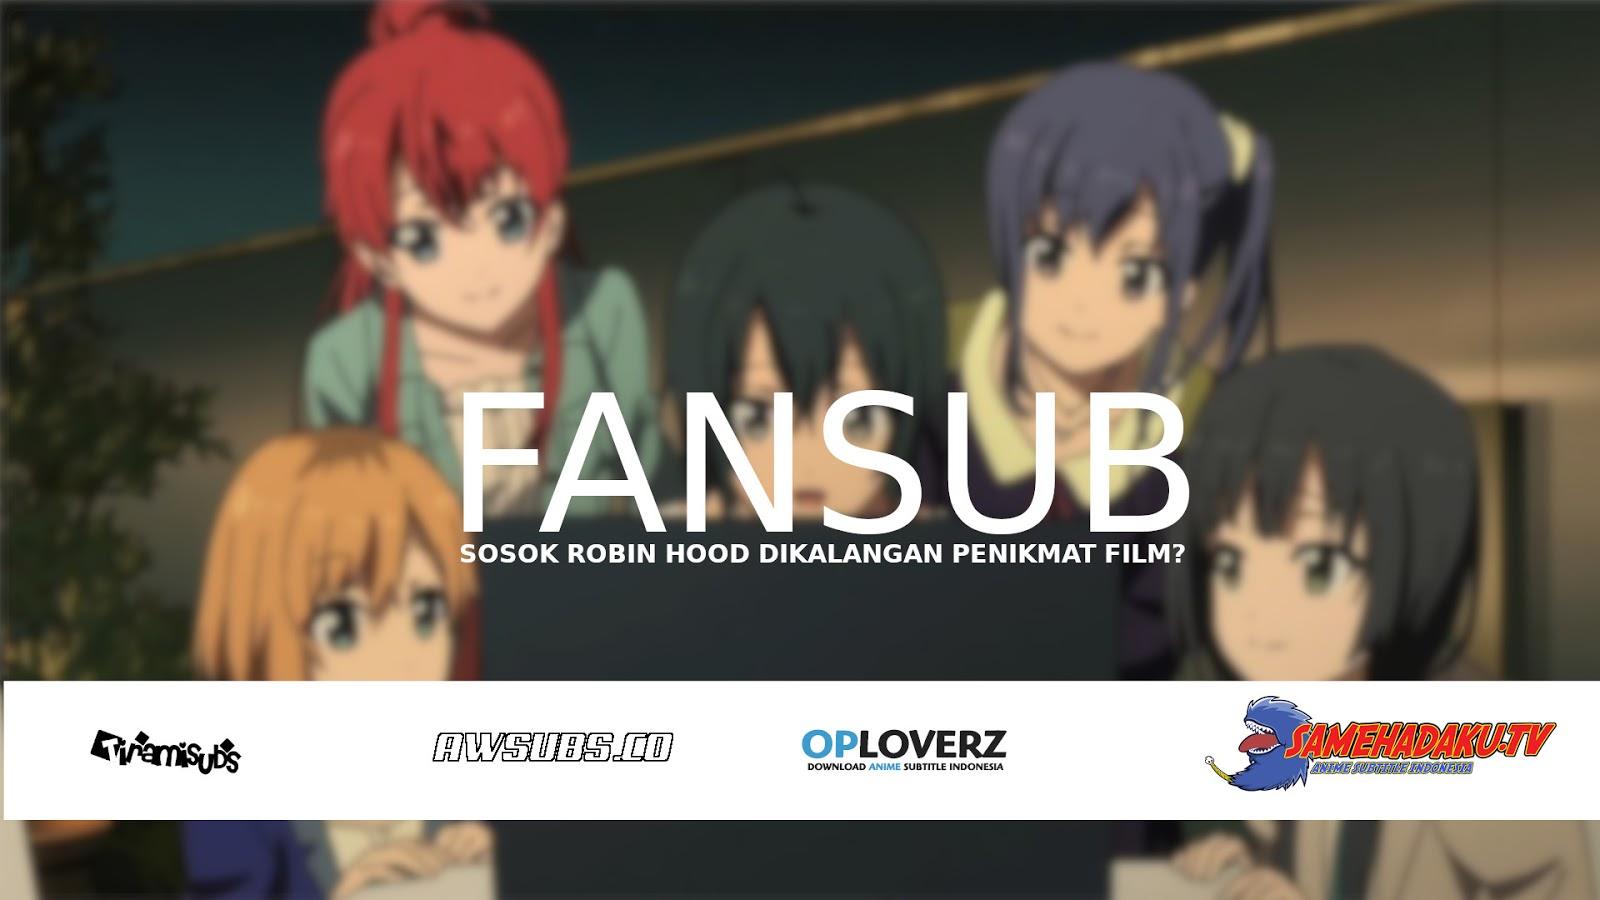 Mengenal Fansub Anime dan Film